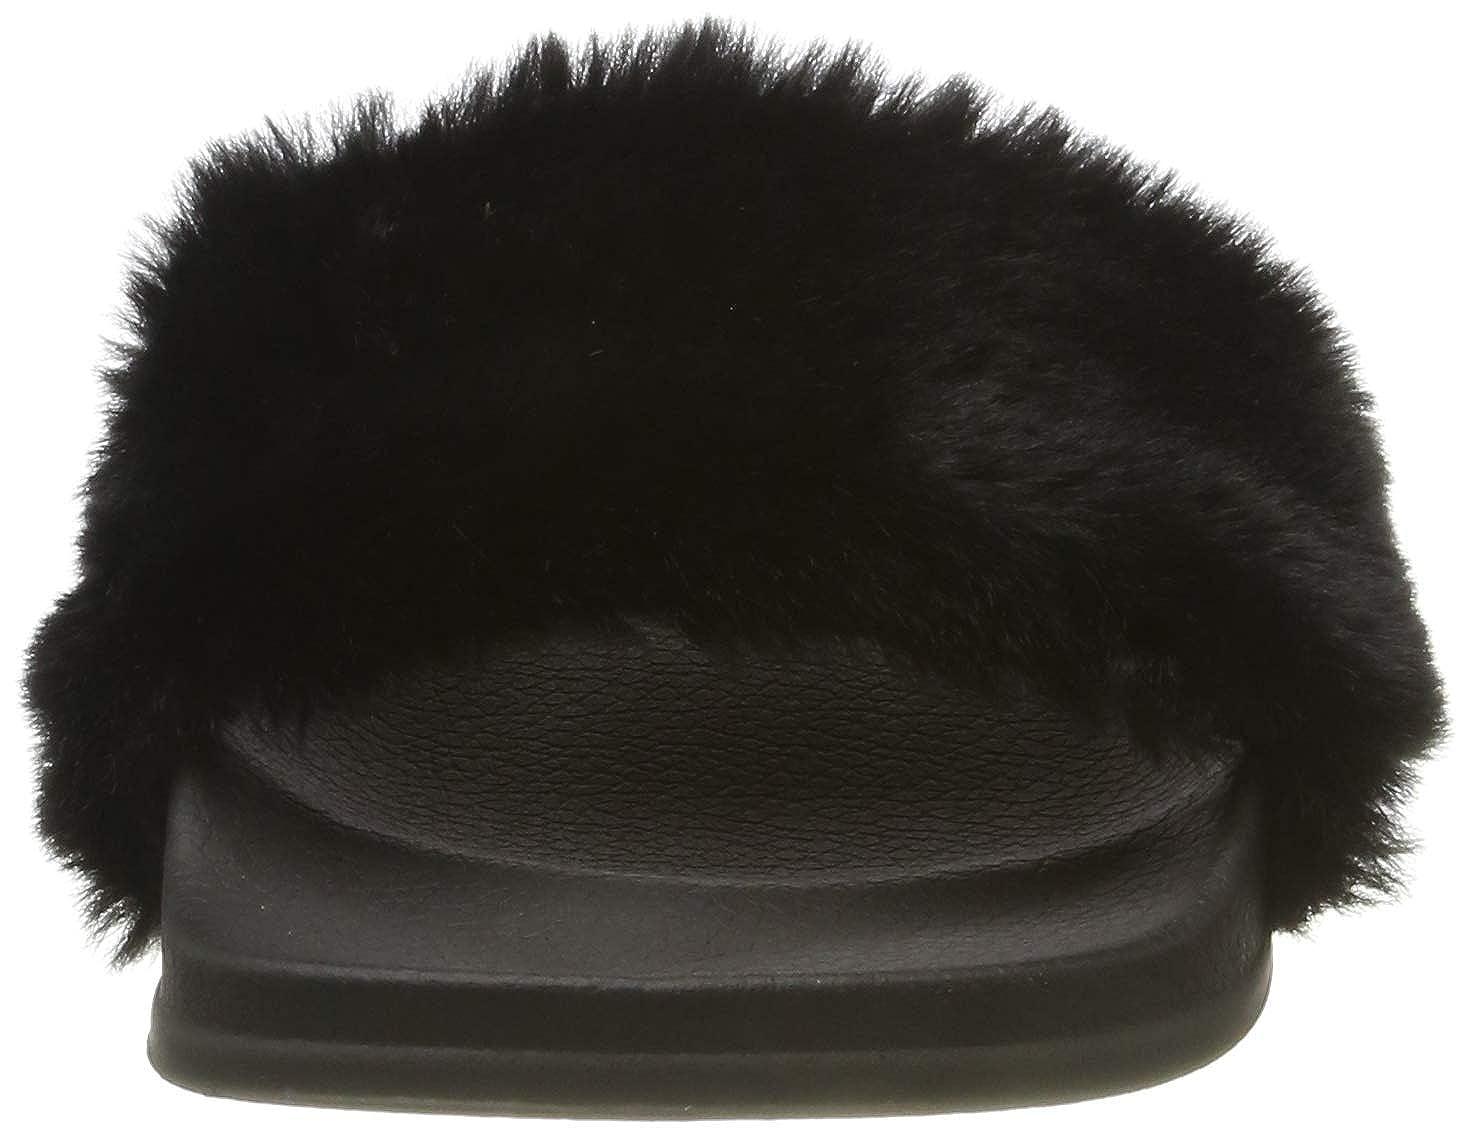 APIKA Damen Flip Flop Kunstpelz Slipper Fuzzy Fluffy Comfy Sliders Offene Zehe